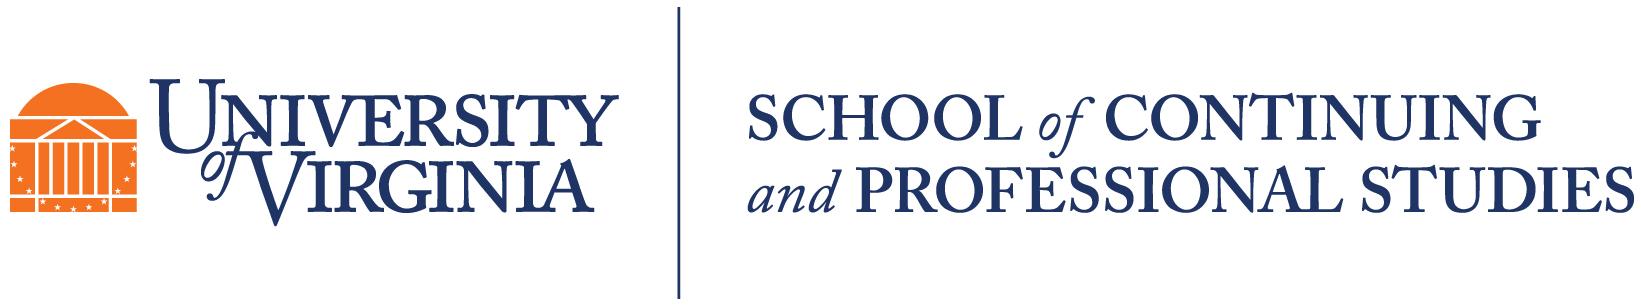 SCPS-Latest-Central-Logo-horizontalr-blue-copy